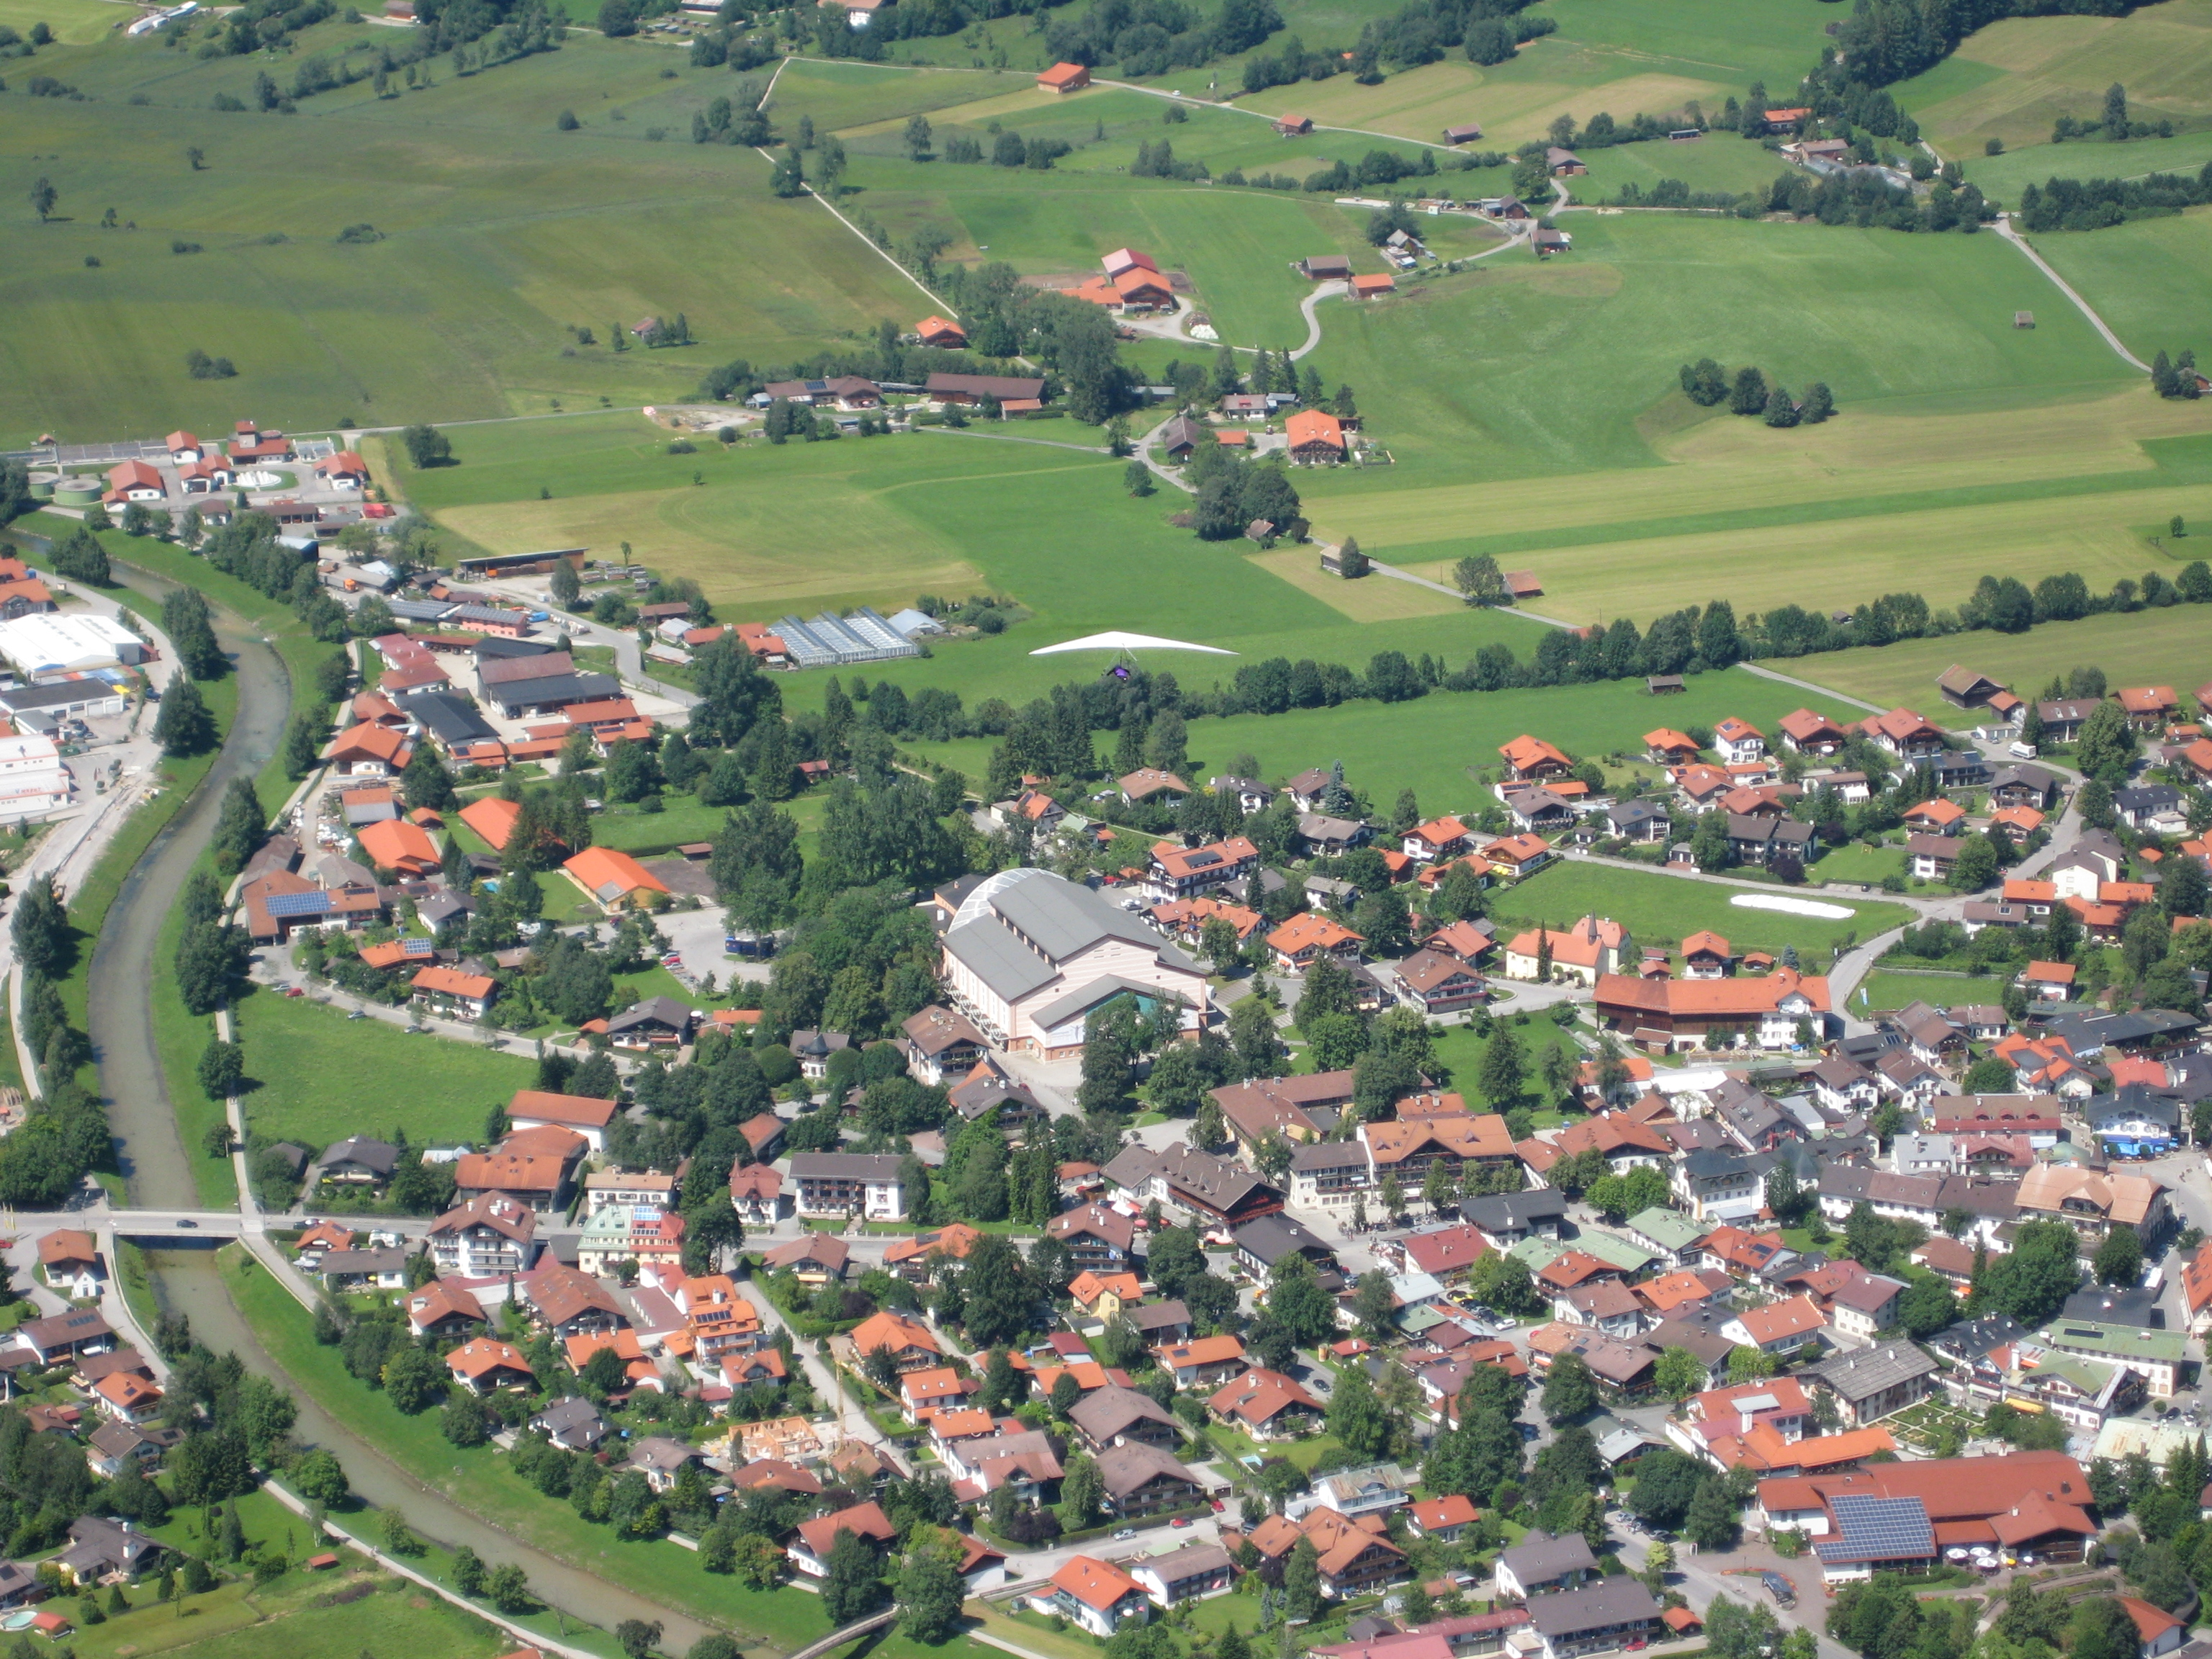 File:Oberammergau Passionstheater - Kofel.jpg - Wikimedia Commons